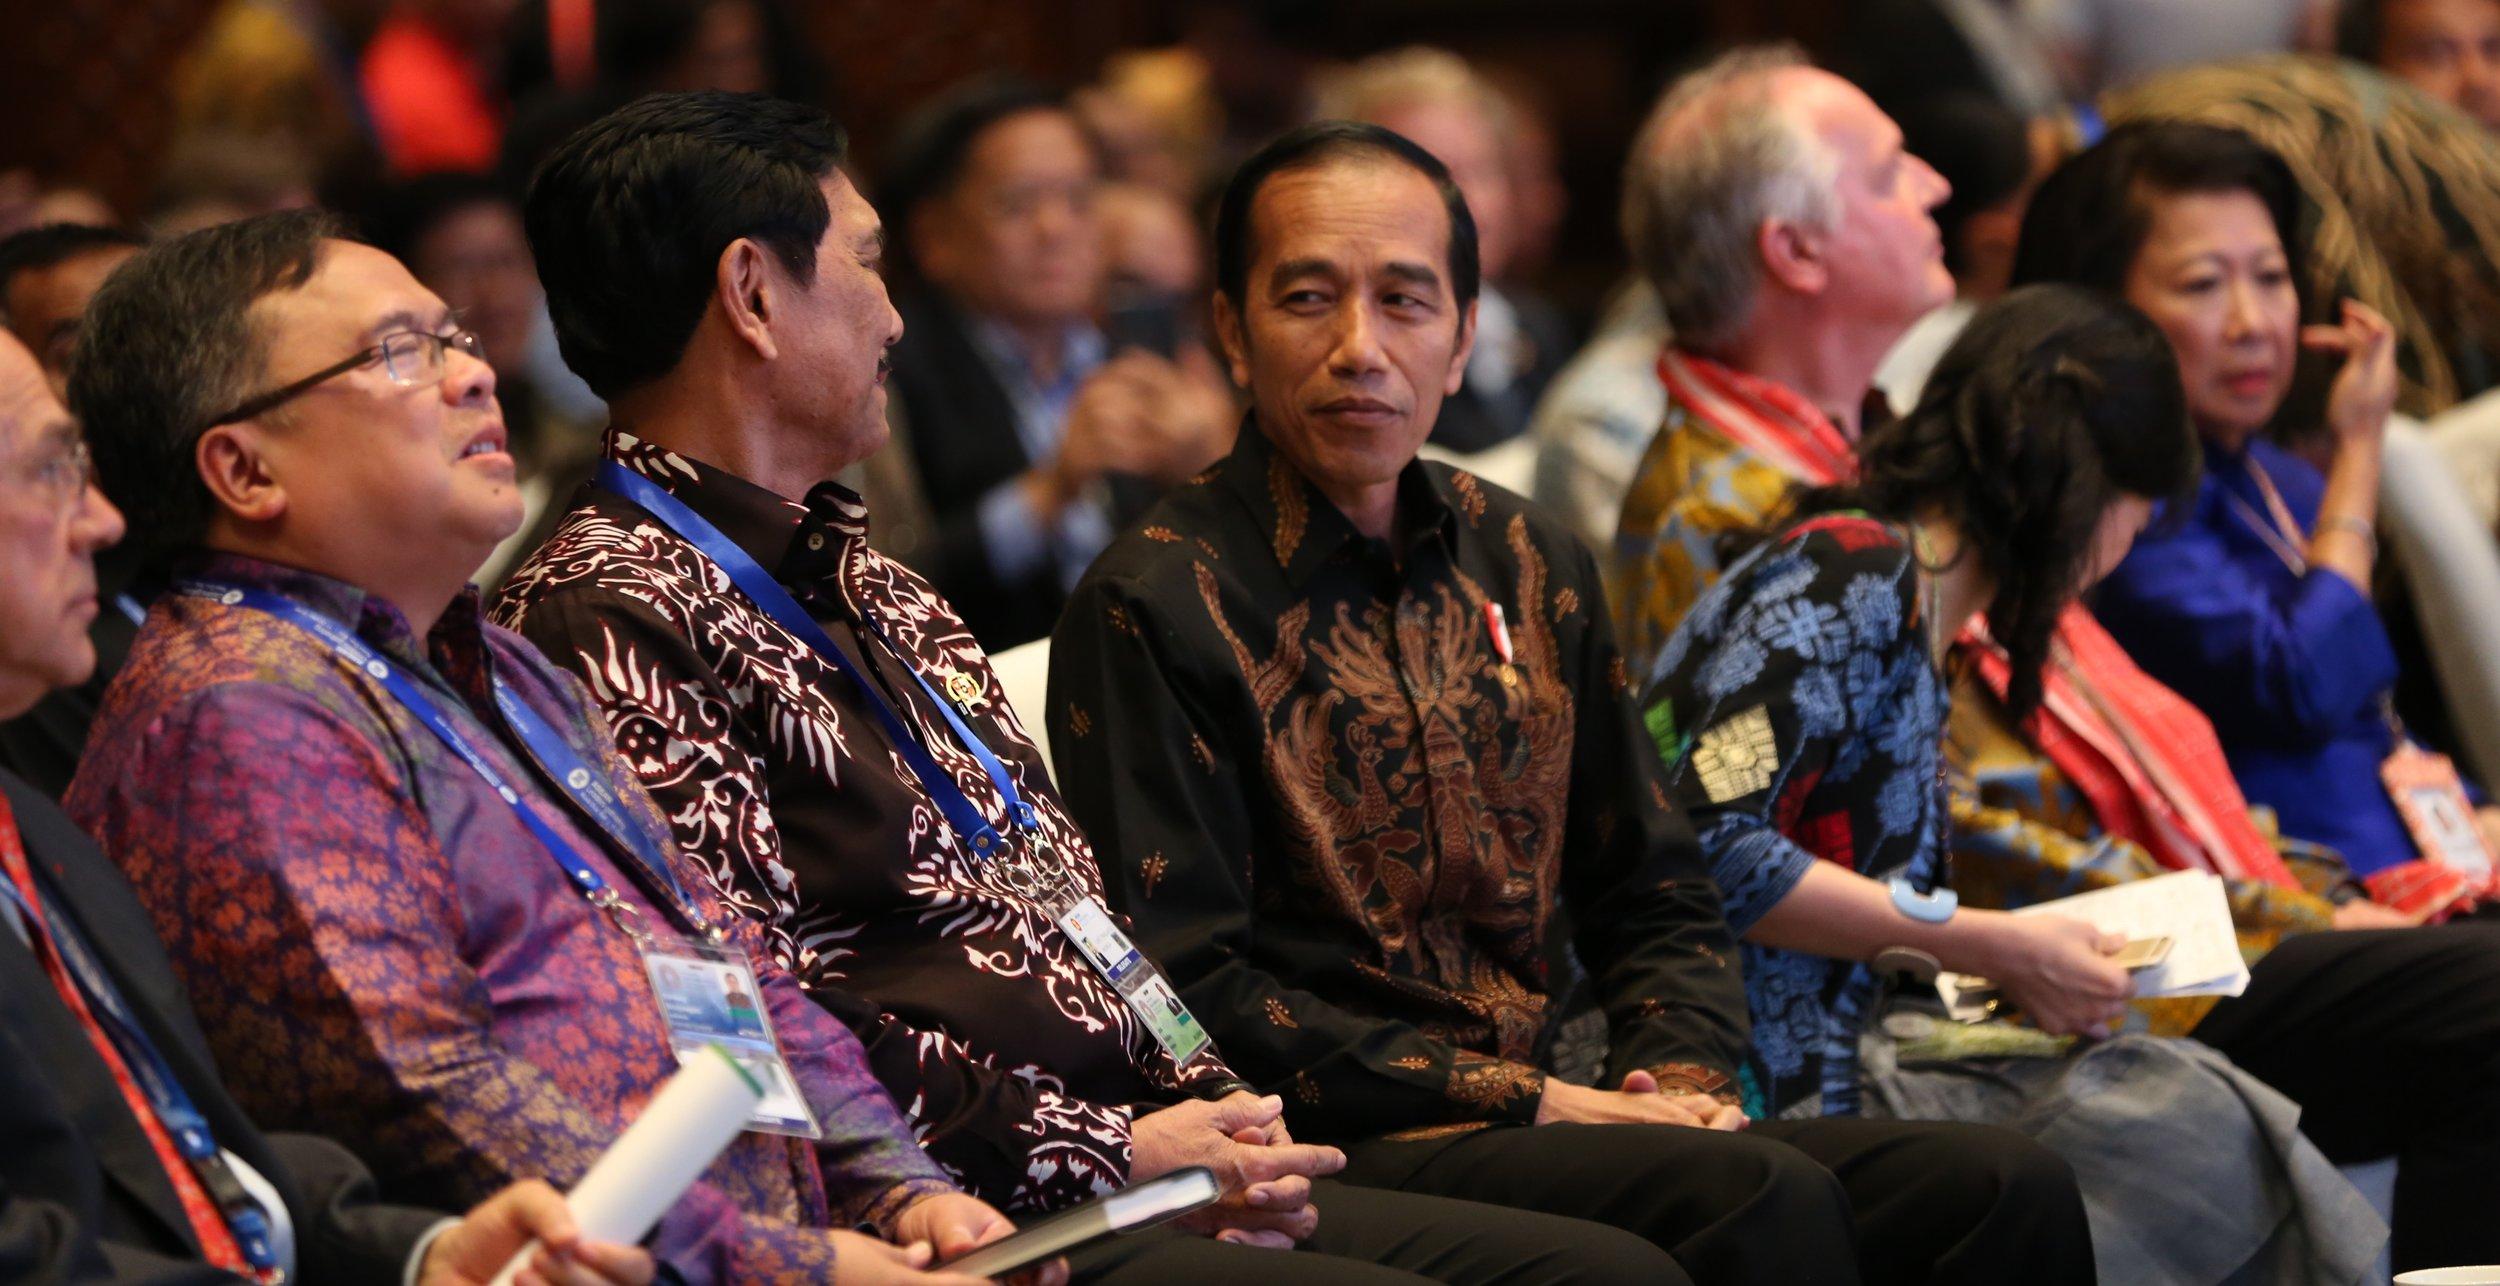 President of Indonesia, Joko Widodo in the audience at the Tri Hita Karana Forum